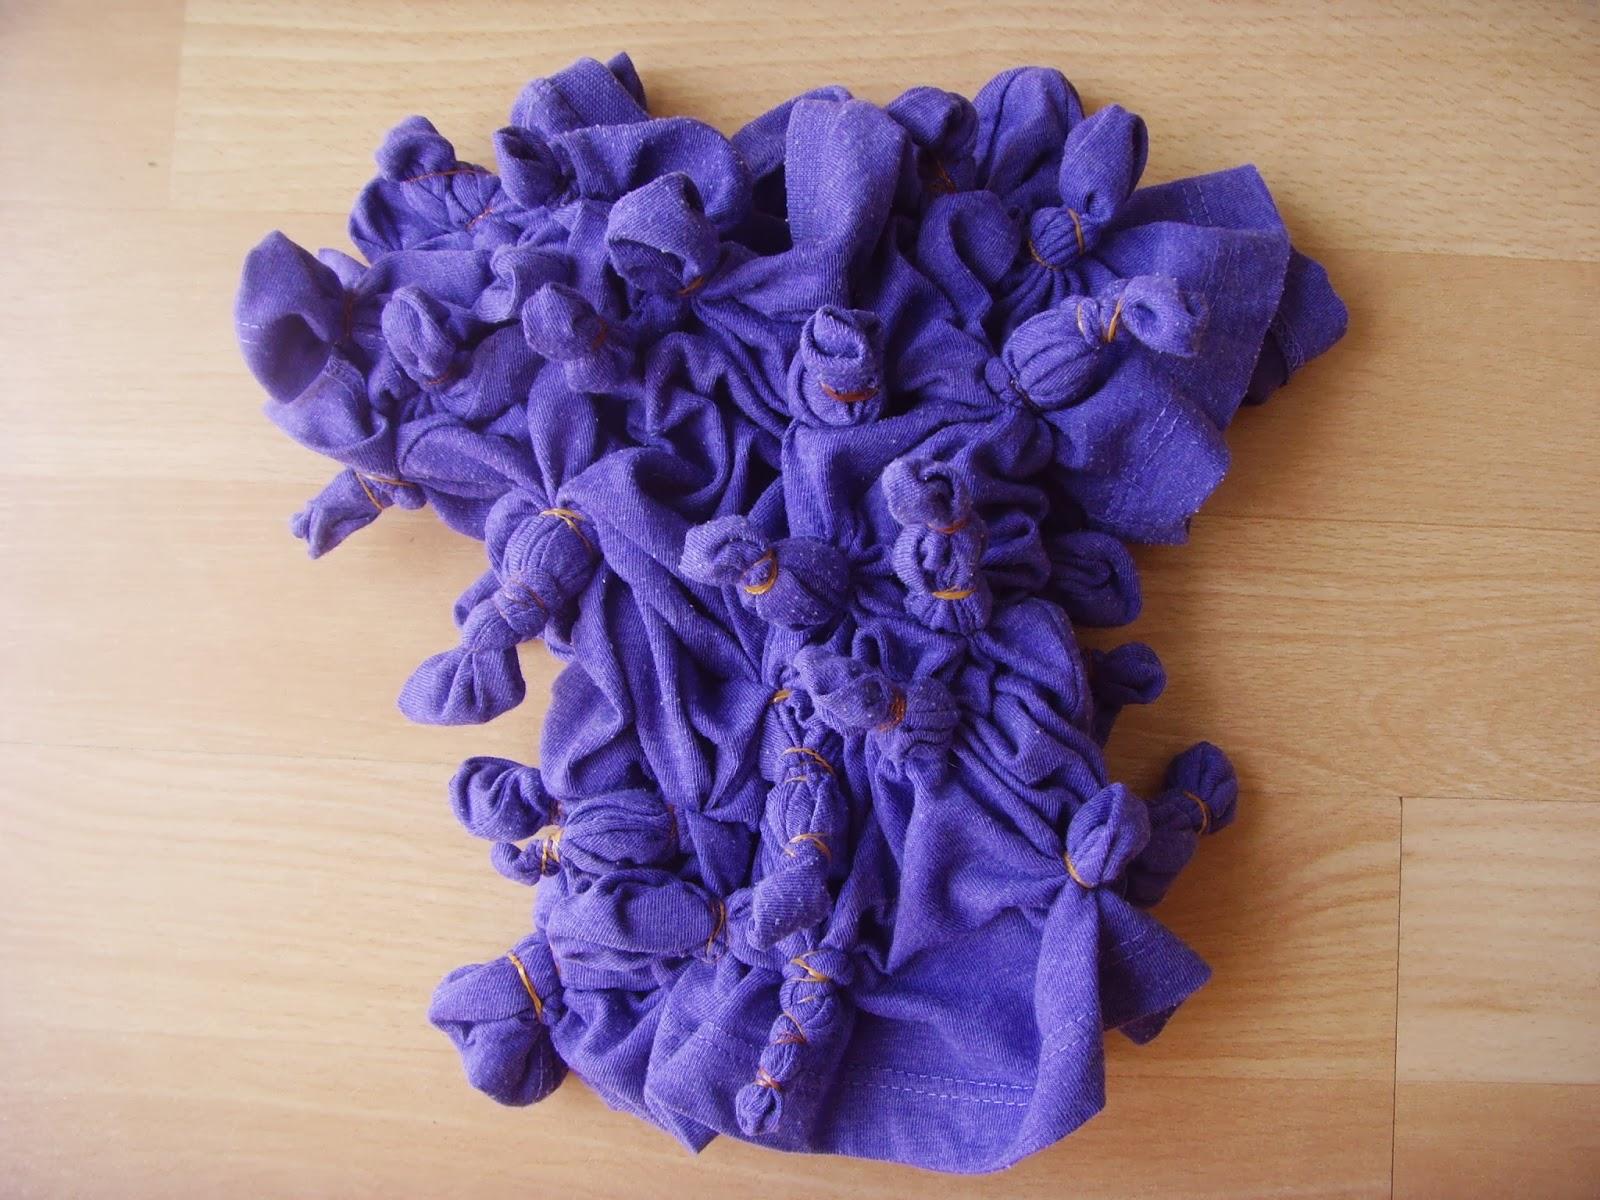 Diy Reverse Tie Dye In 3 Techniques Part 2 Dipped Hem